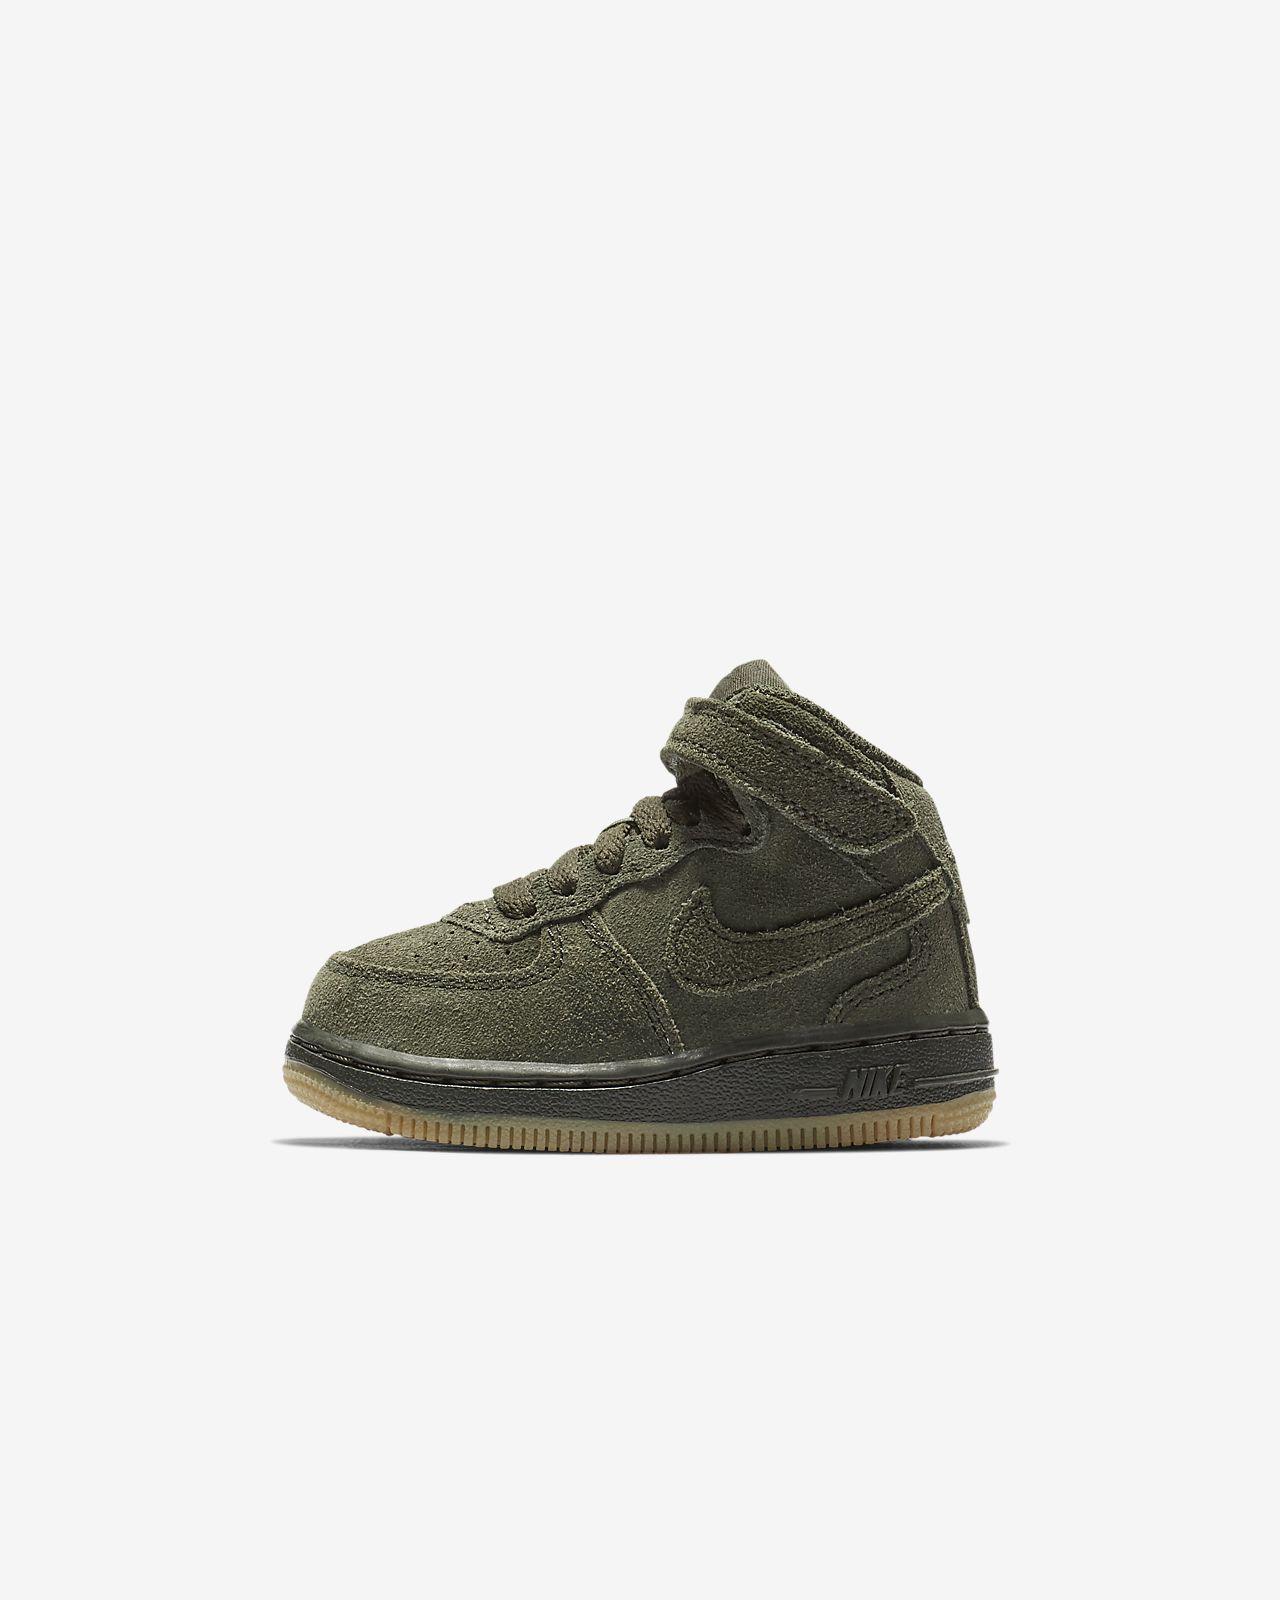 quality design 651d1 ed8fa ... Nike Air Force 1 Mid LV8 sko for sped-småbarn